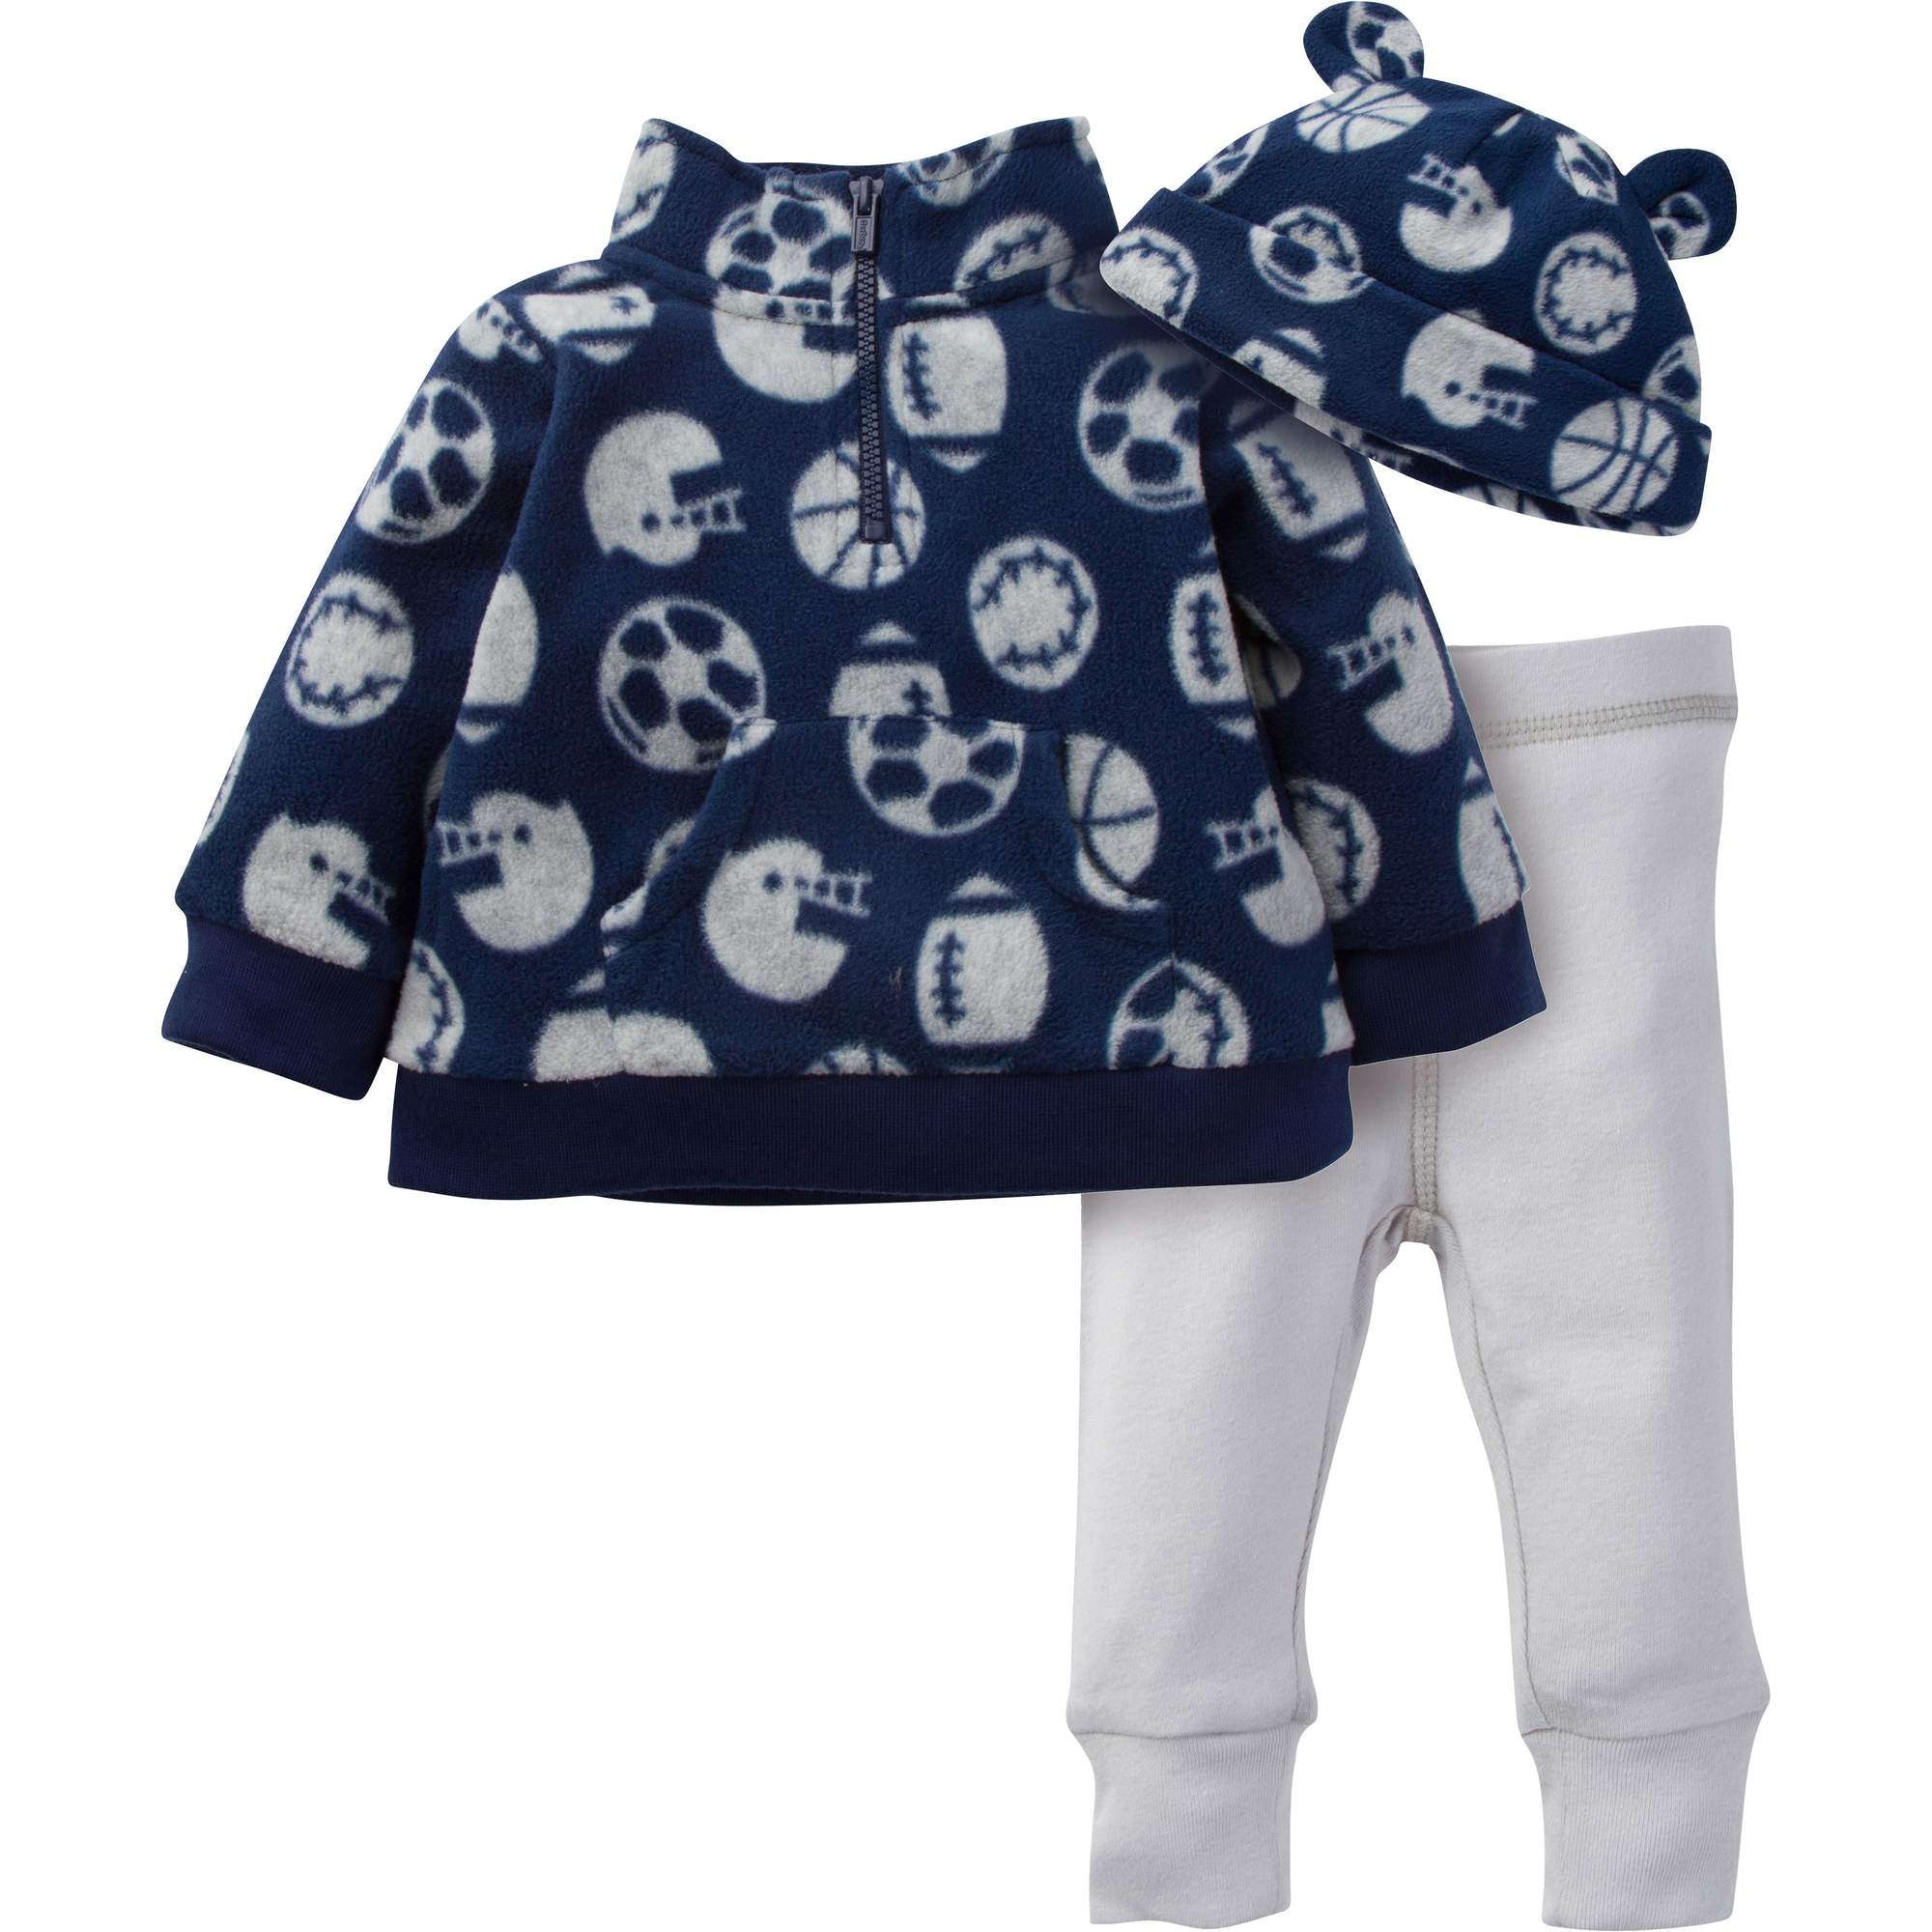 721ad7581 Gerber Childrenswear Llc - Gerber Childrenswear LLC Microfleece Zip Jacket